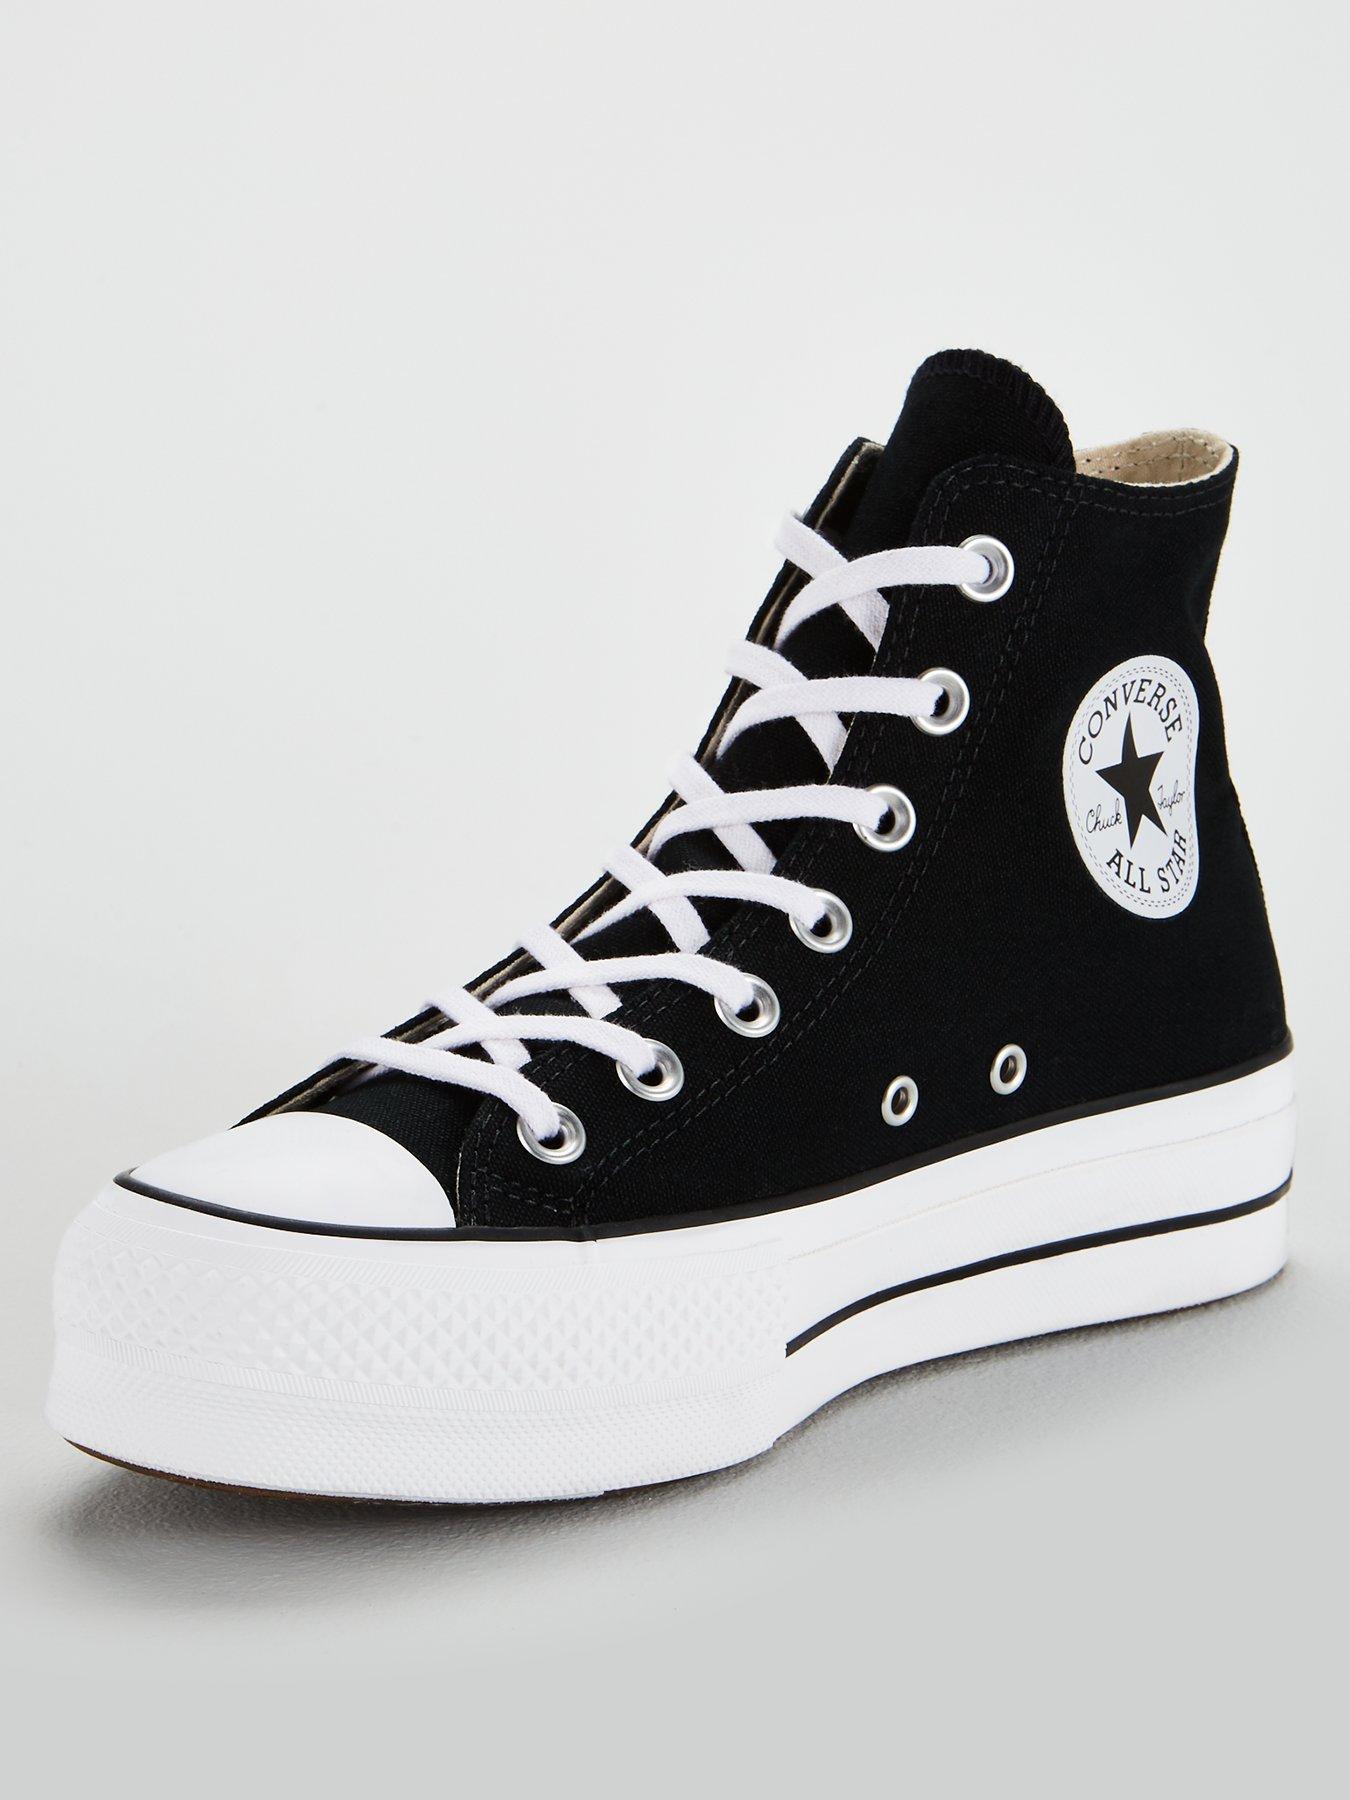 Converse Chuck Taylor All Star Platform Lift Hi - Black/White